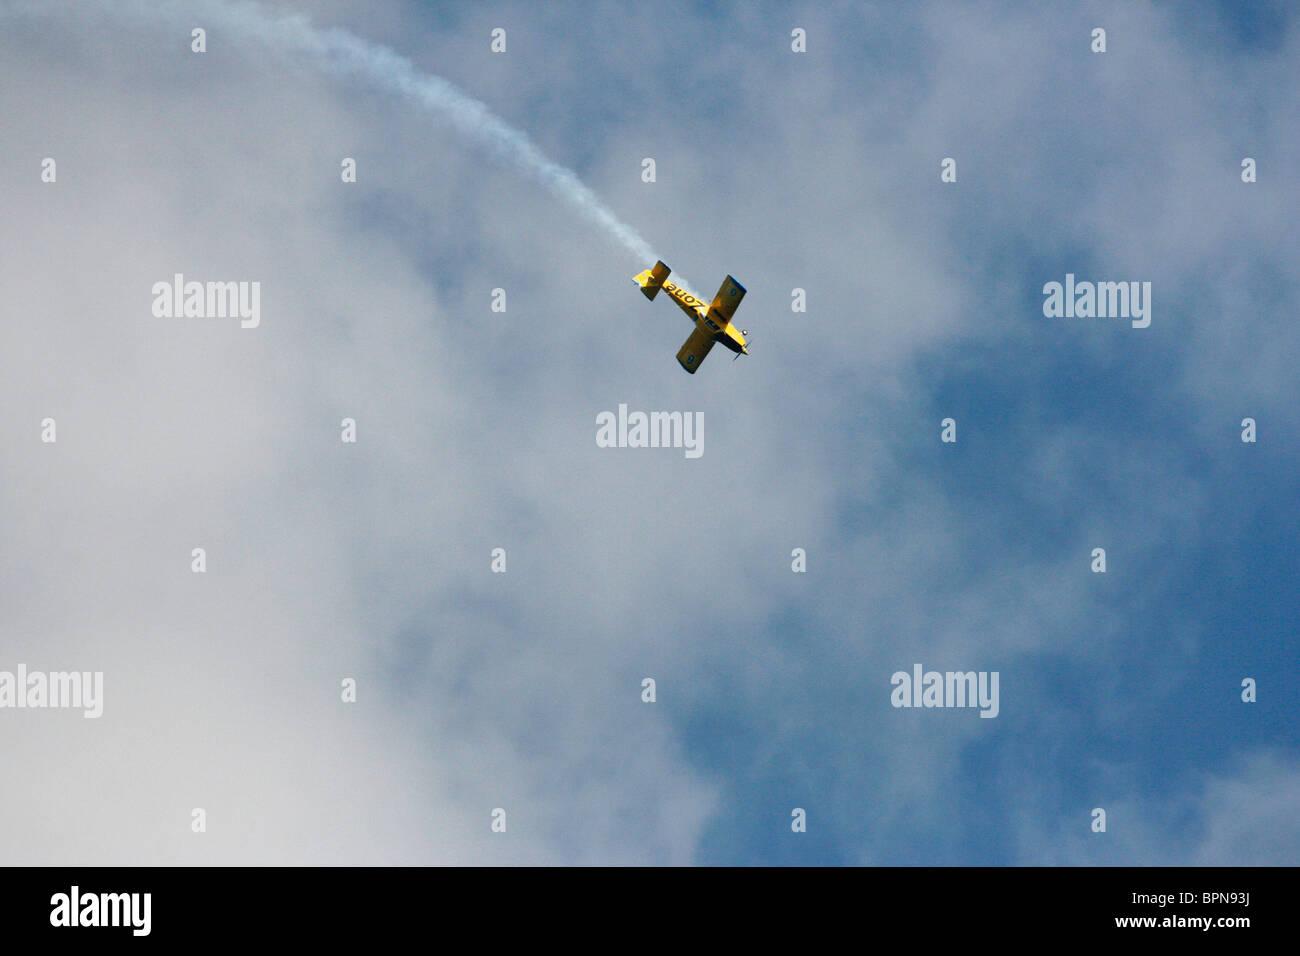 A Fuji FA200 Aero Subaru single engine aerobatic plane performing aerobatics with a smoke trail - Stock Image